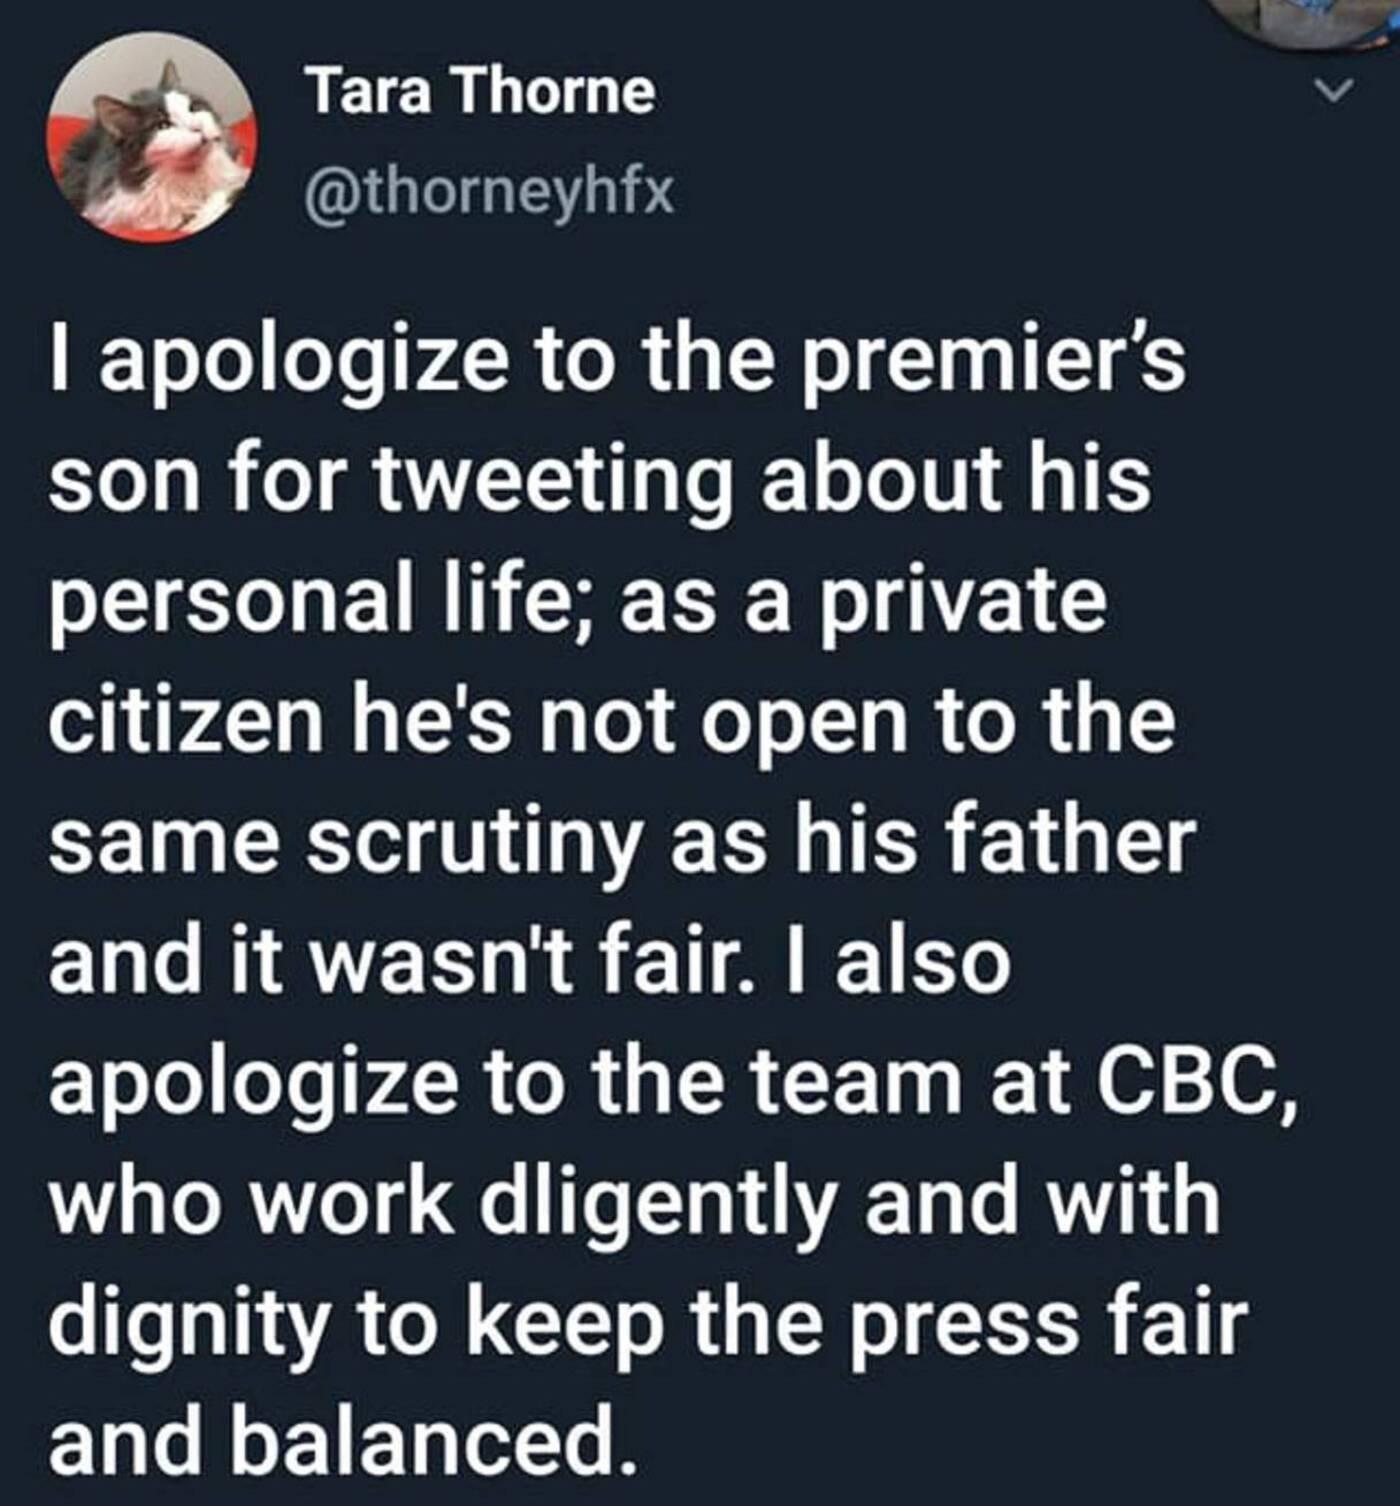 tara thorne twitter